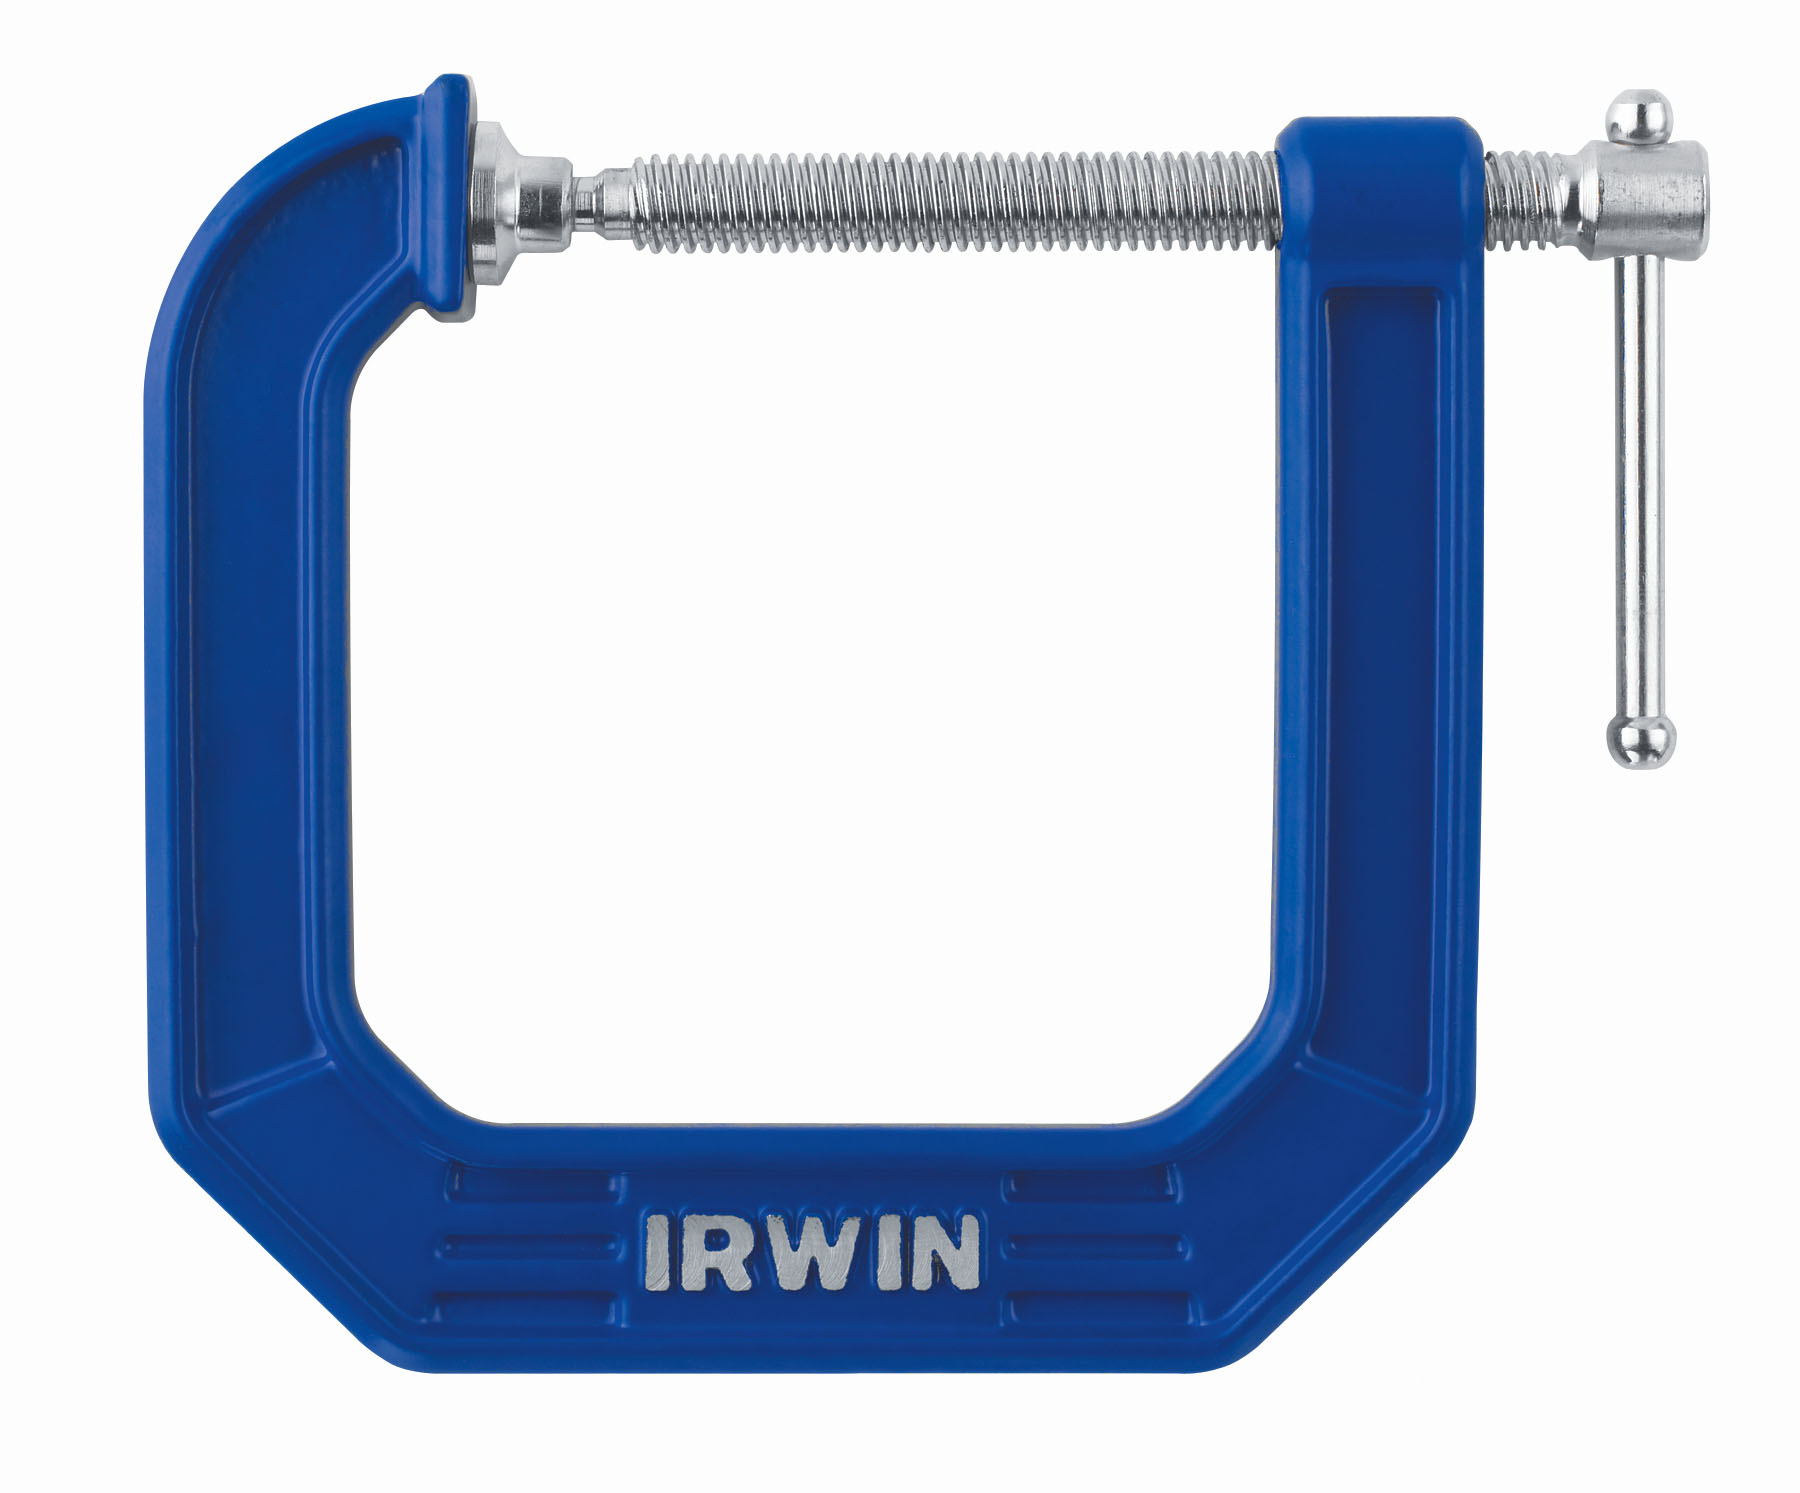 Irwin 3 in. Blue Deep Throat 100 Series C-Clamp